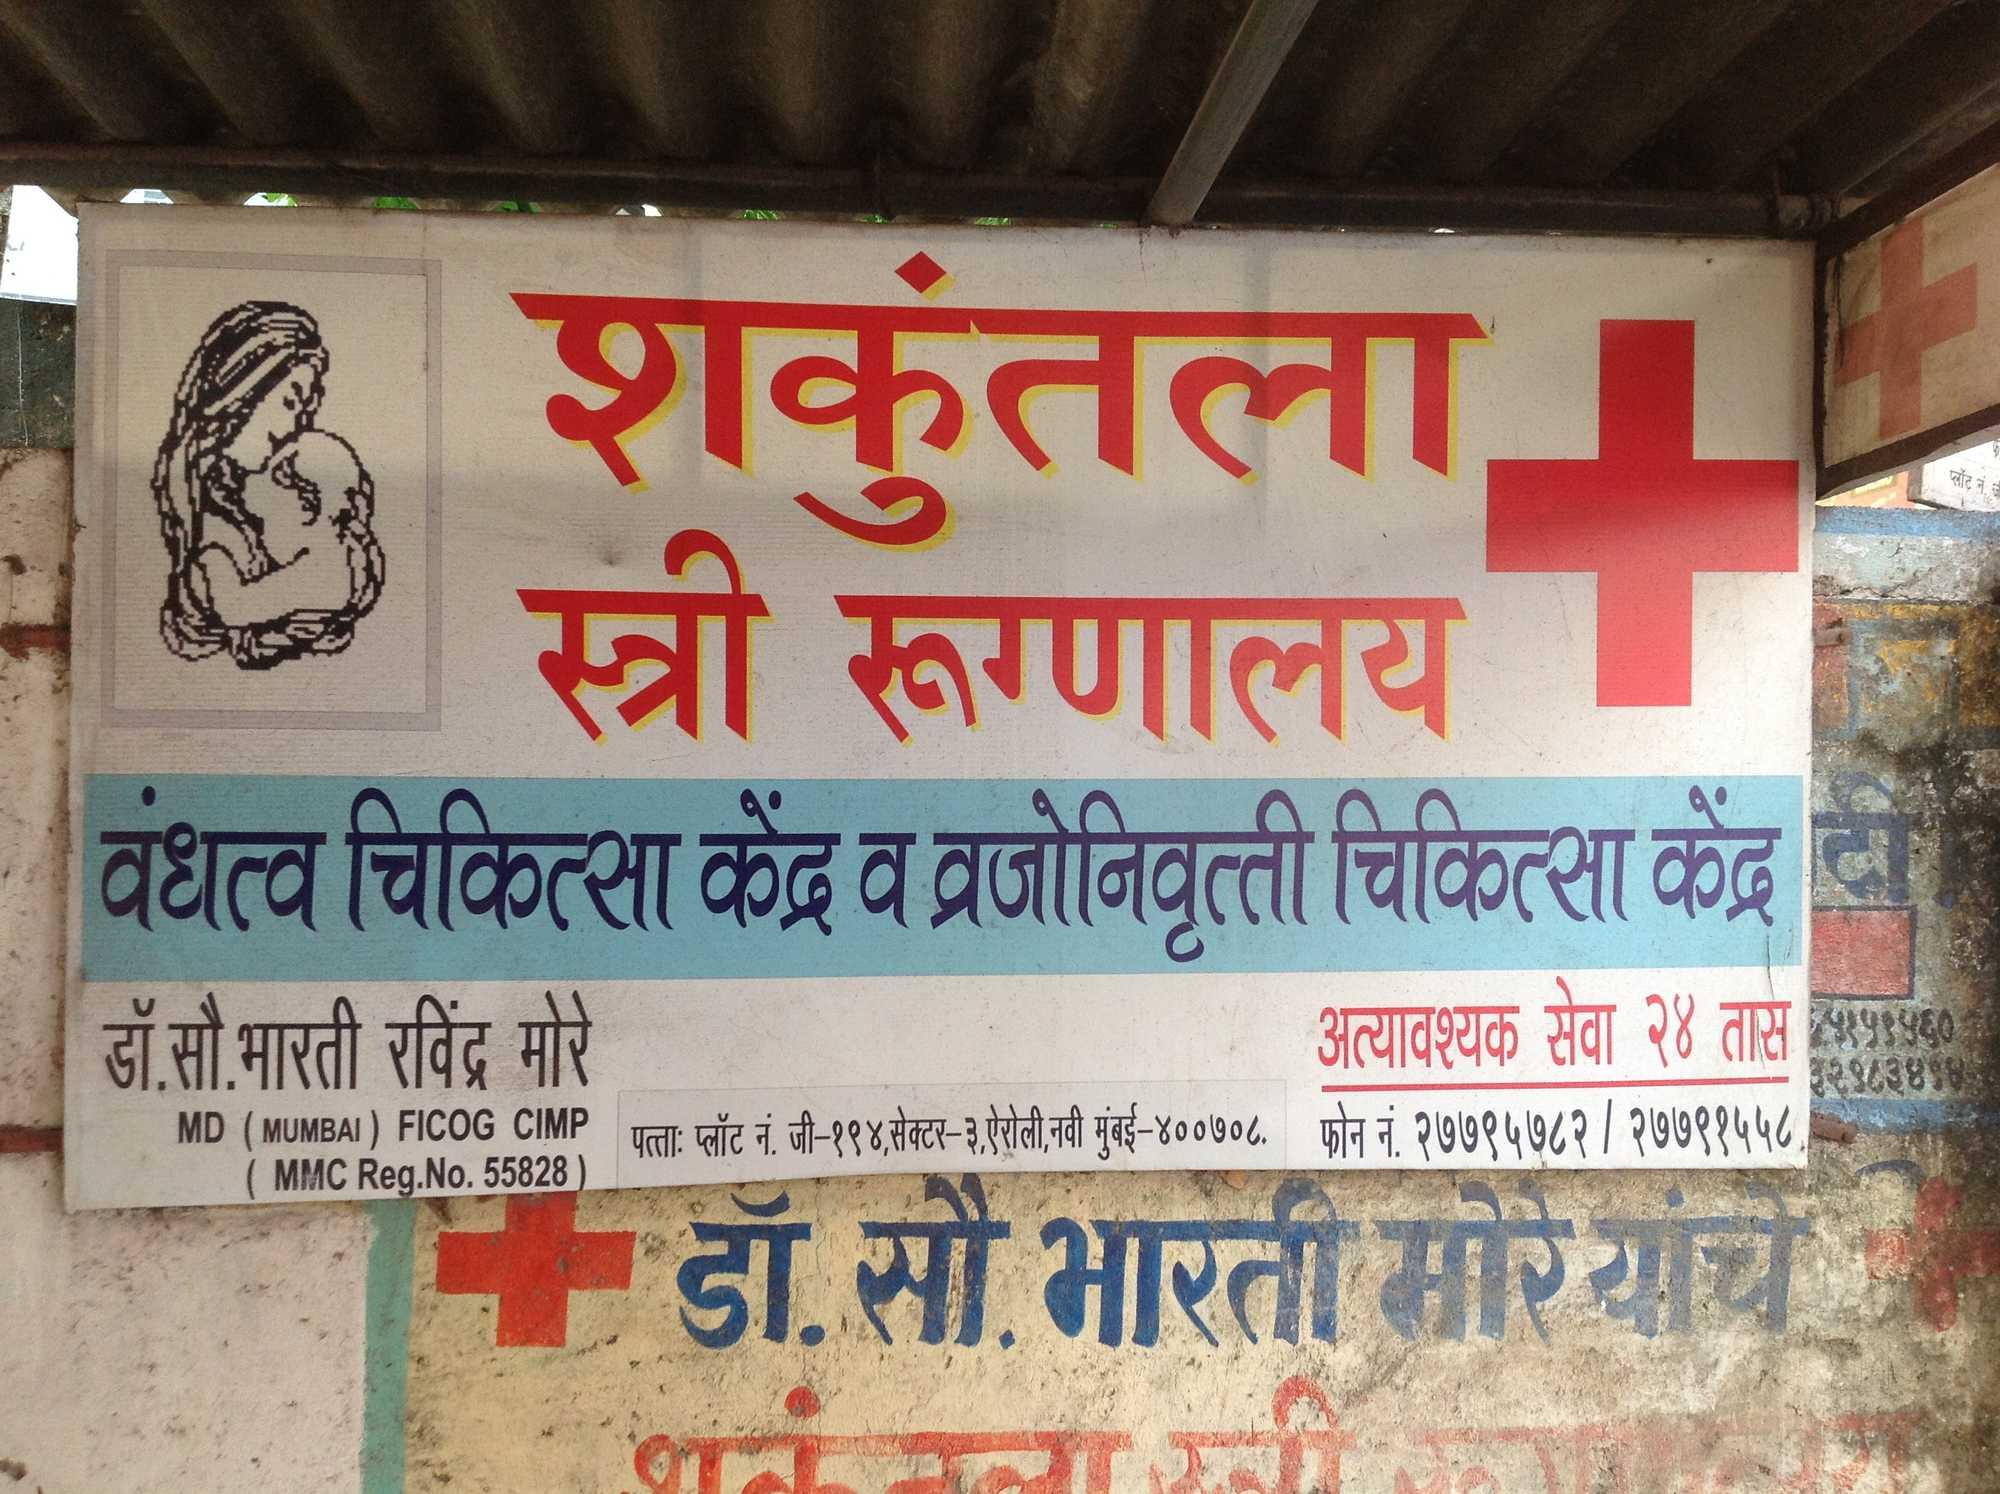 Shakuntla Women's Hospital - Airoli - Navi Mumbai Image